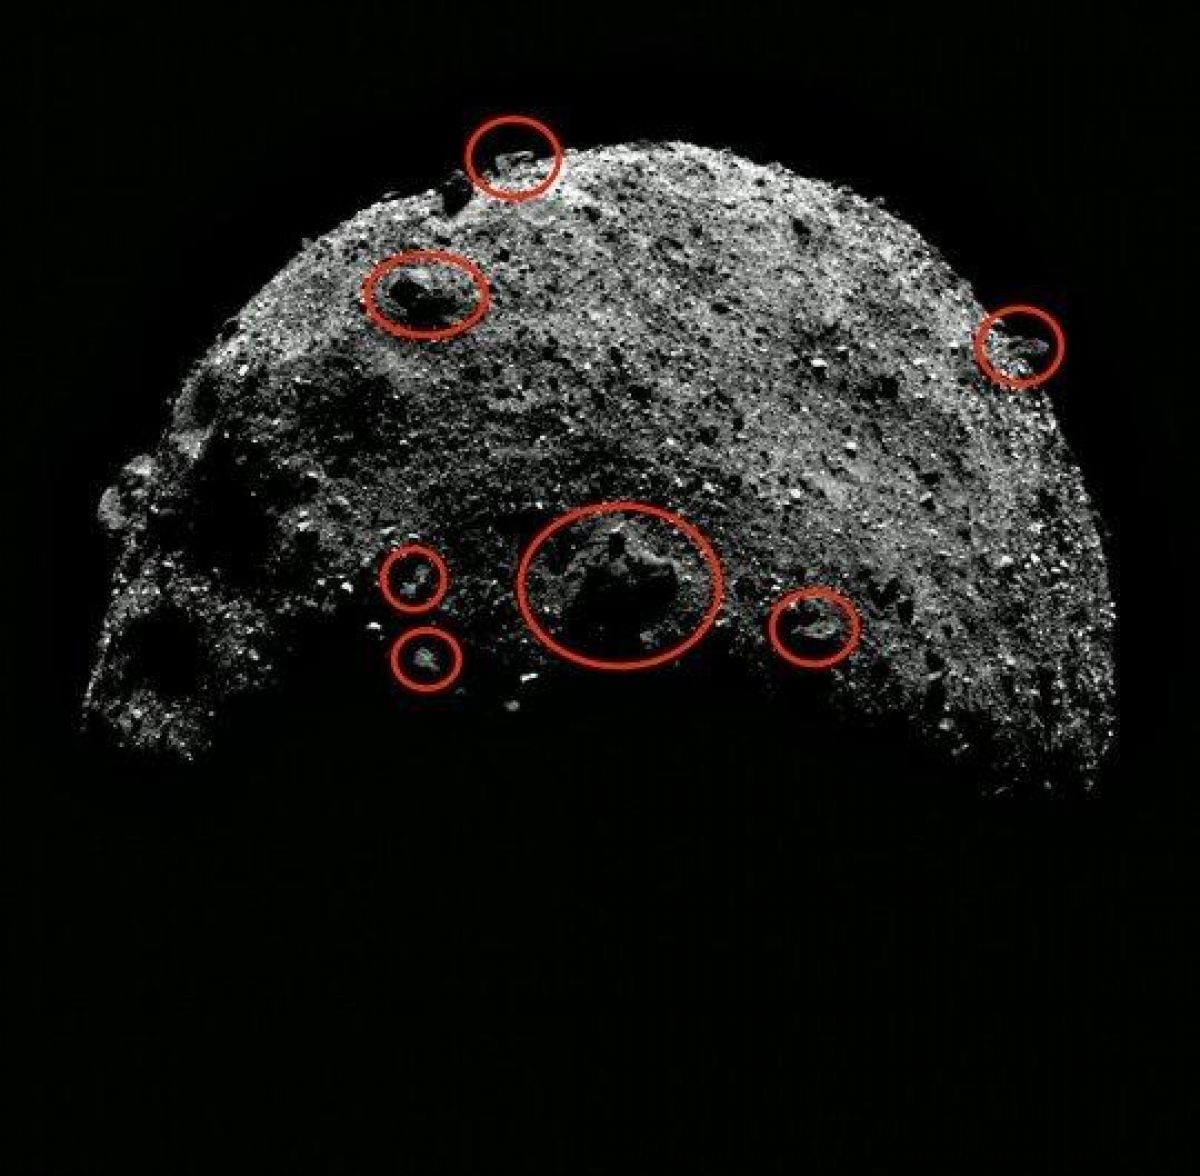 Скотт Уоринг показал снимки с пришельцами на астероиде Бенну